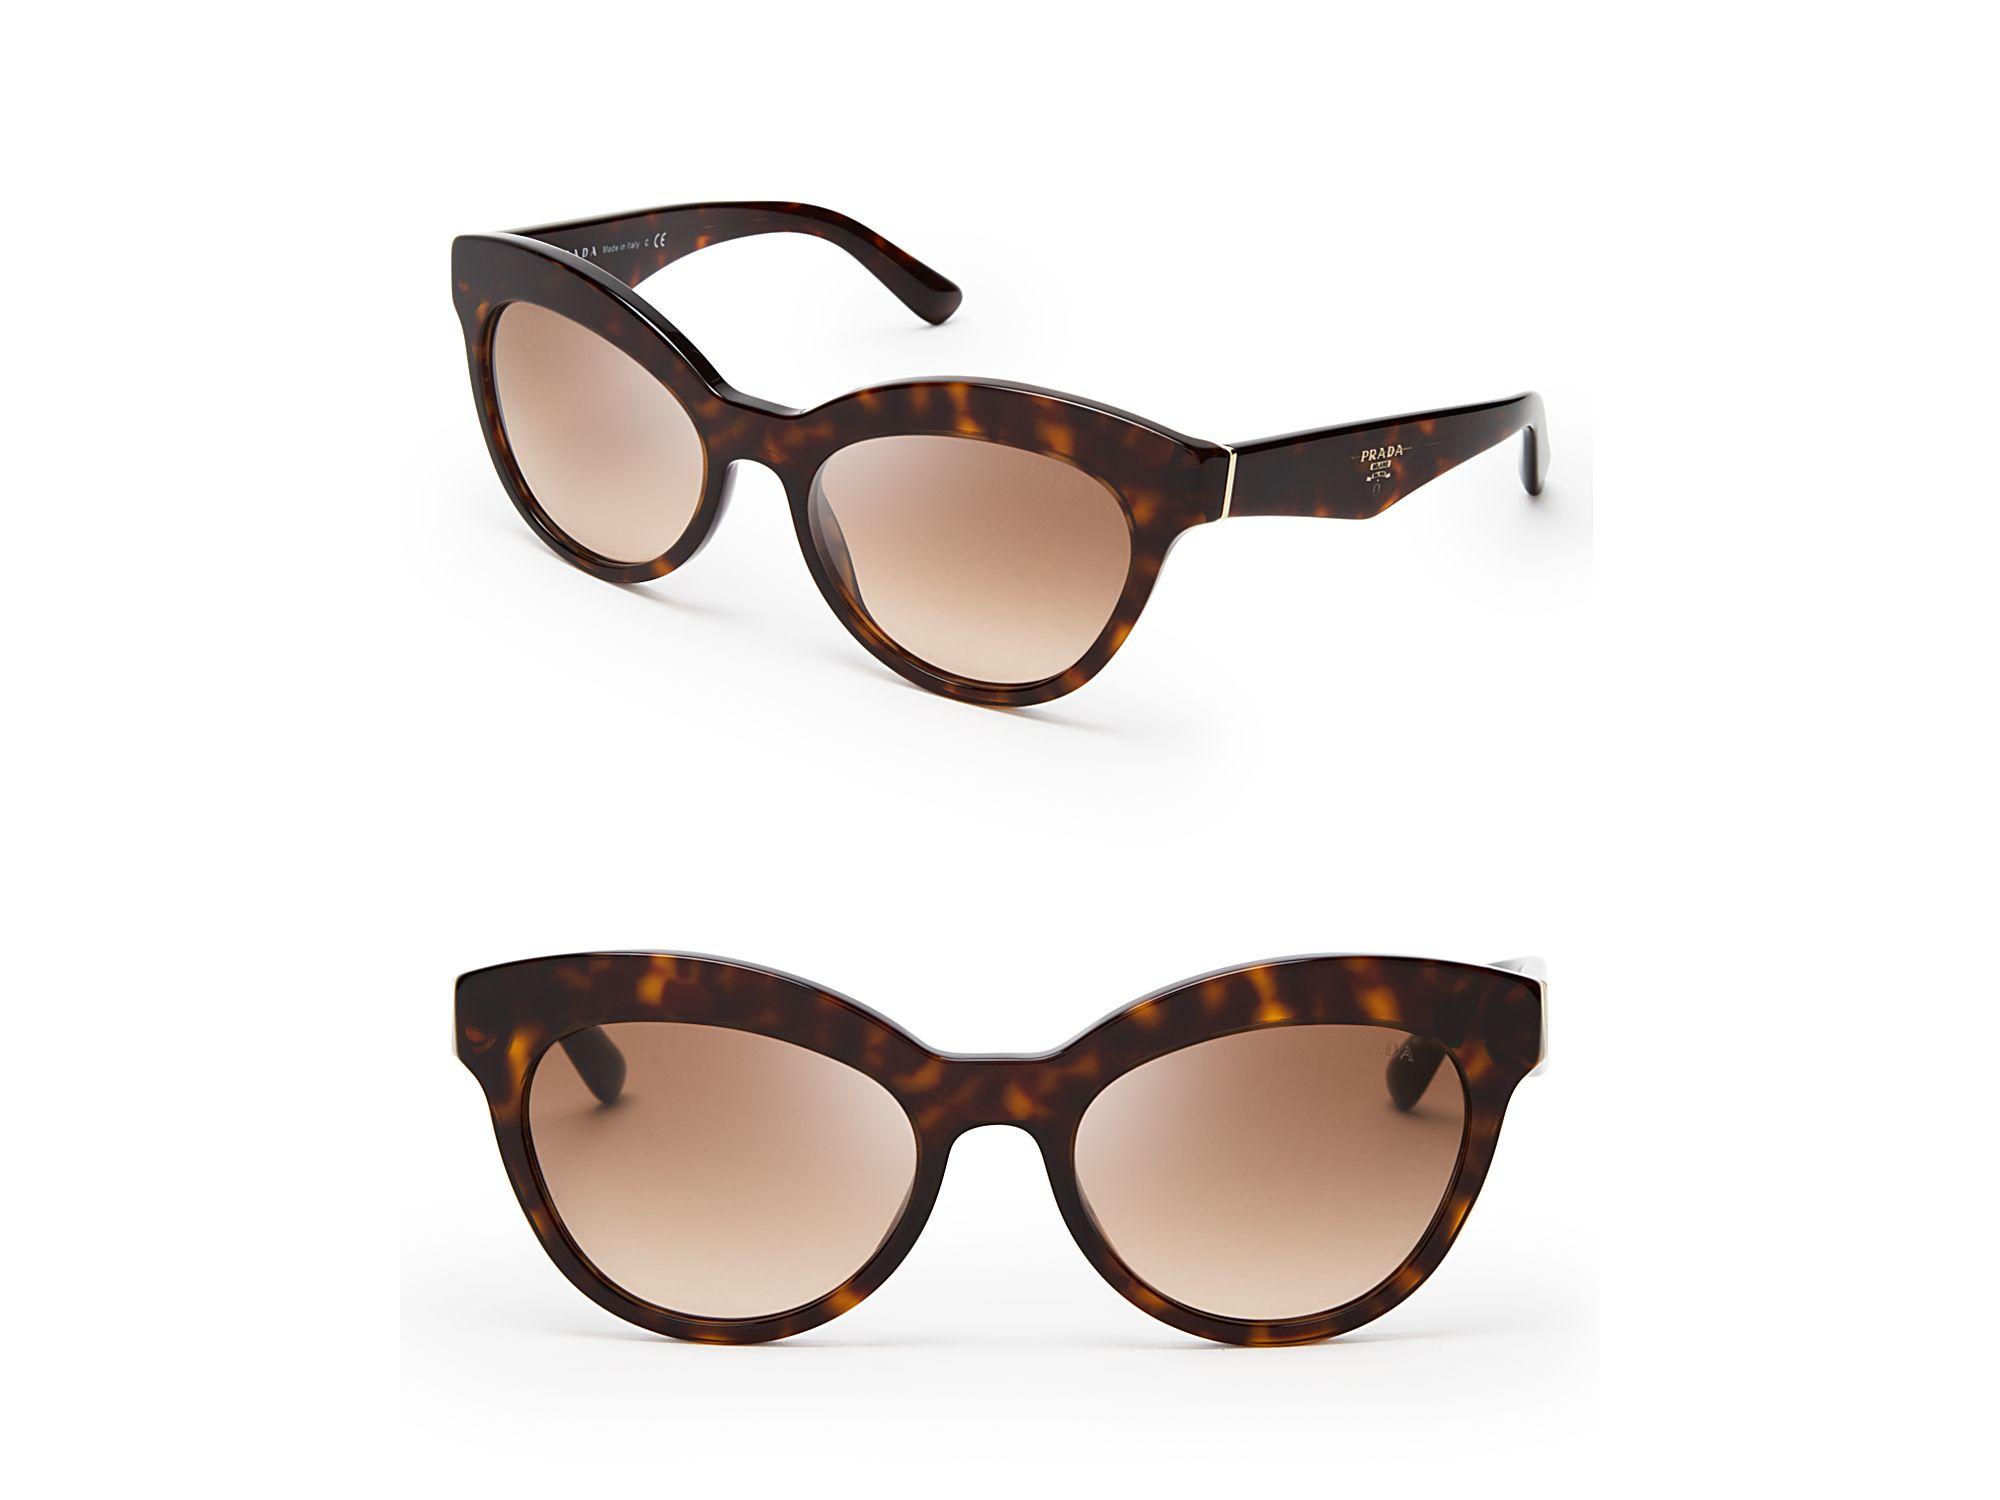 f0b8bdab403 ... france lyst prada heritage cat eye sunglasses in brown 43ac3 abc44